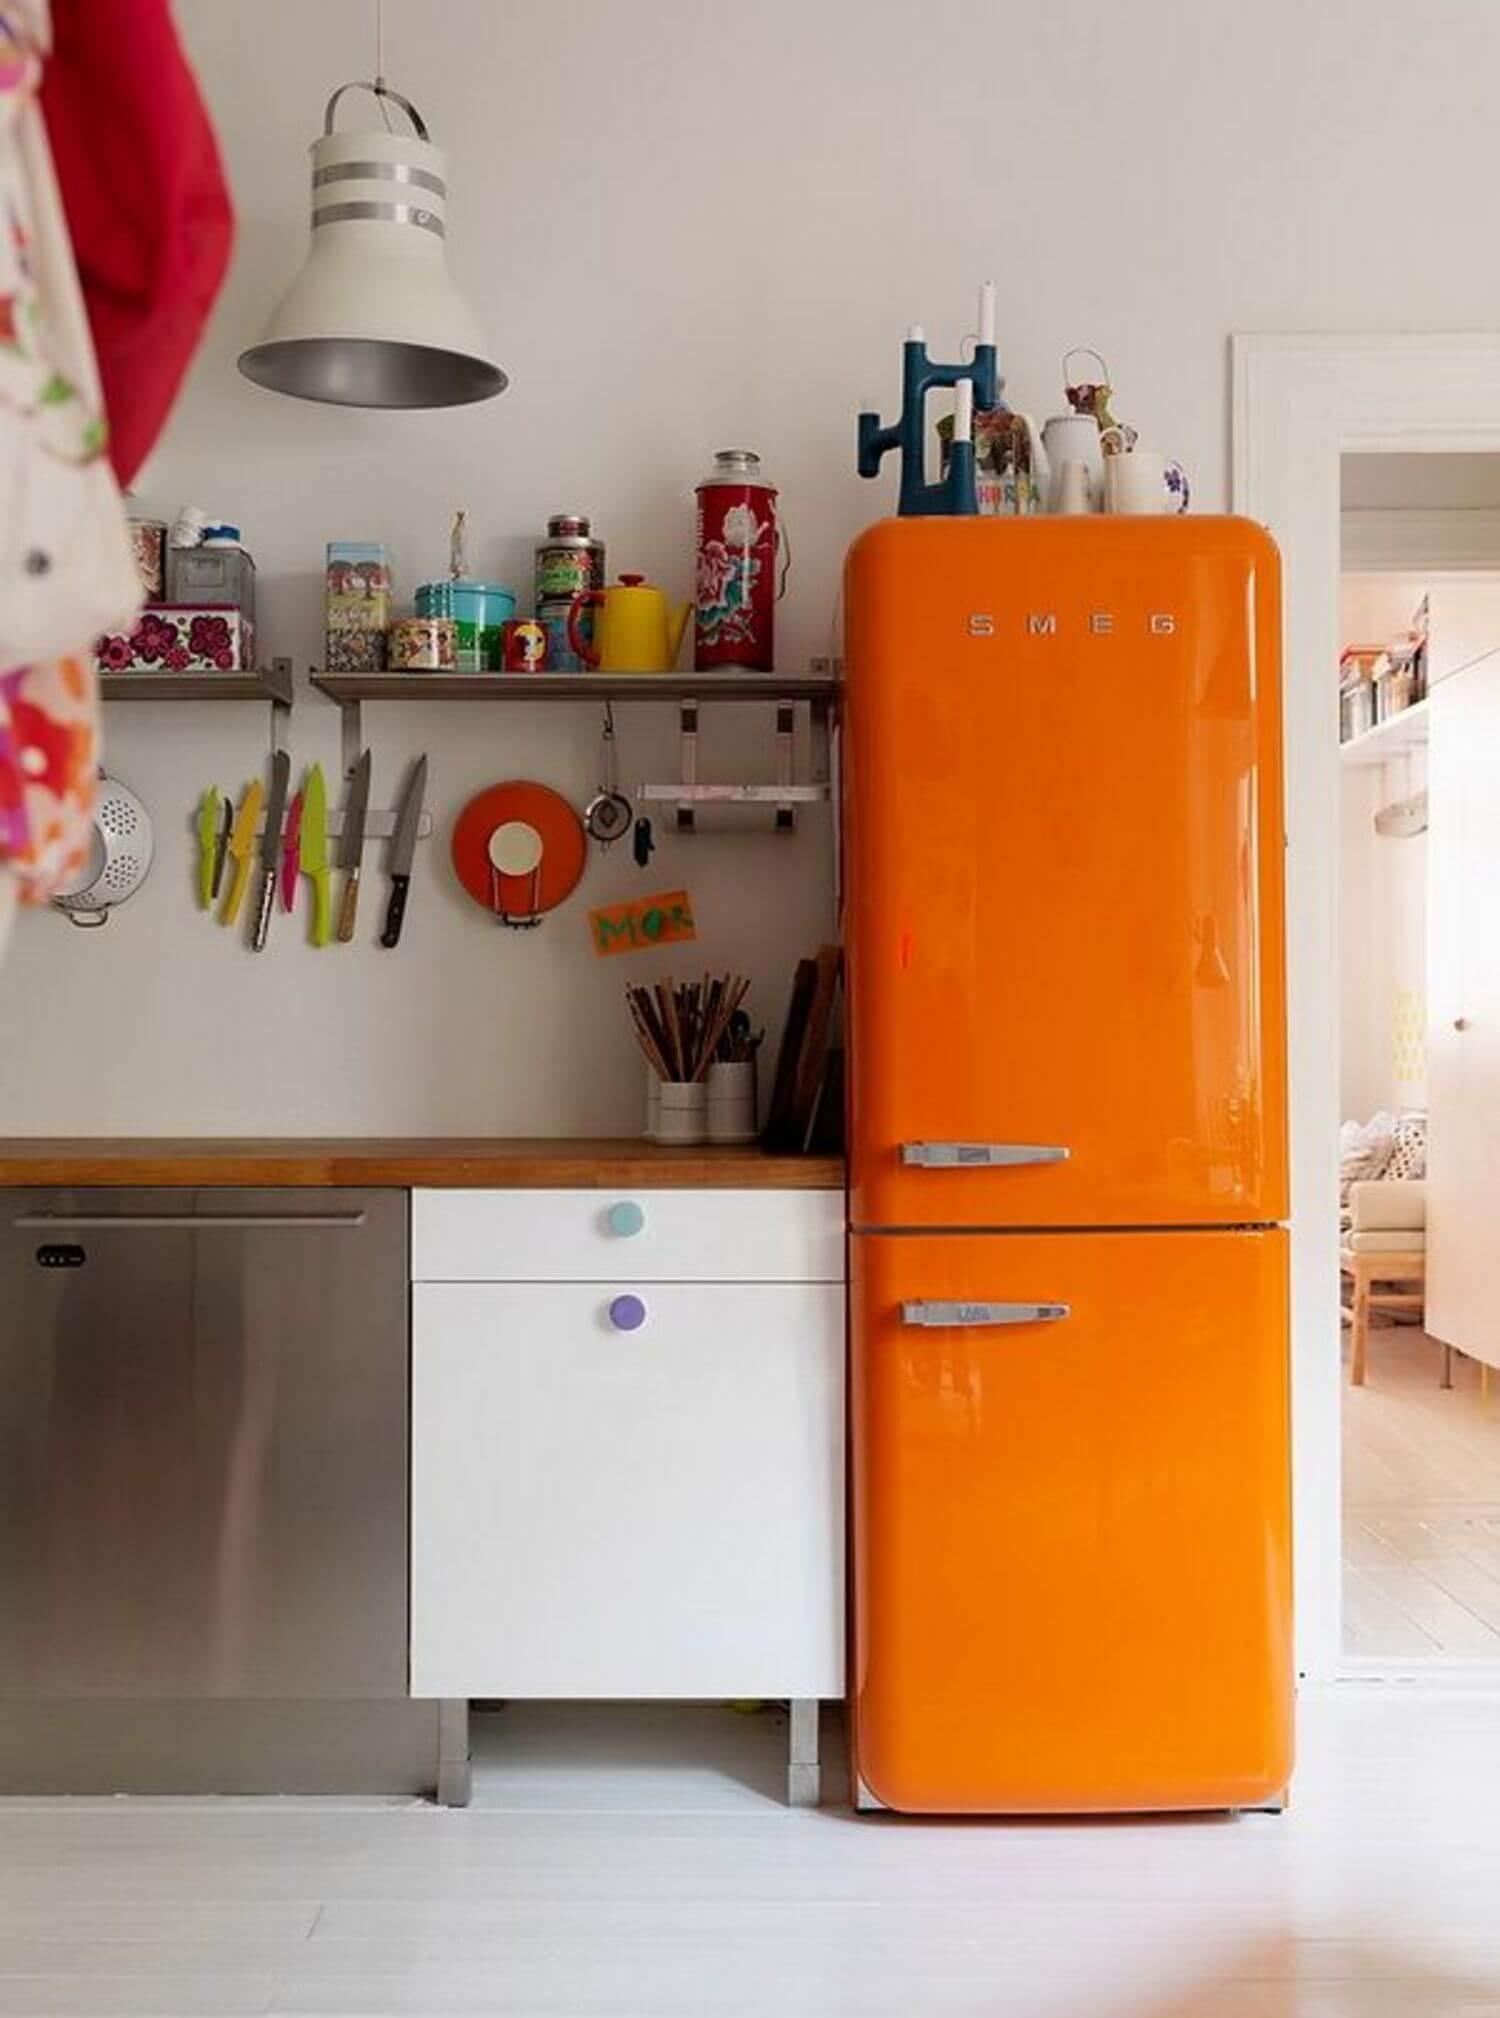 ../articles/3937/3937_5./articles/3937/3937_5 холодильника: интерьер кухни и удобство